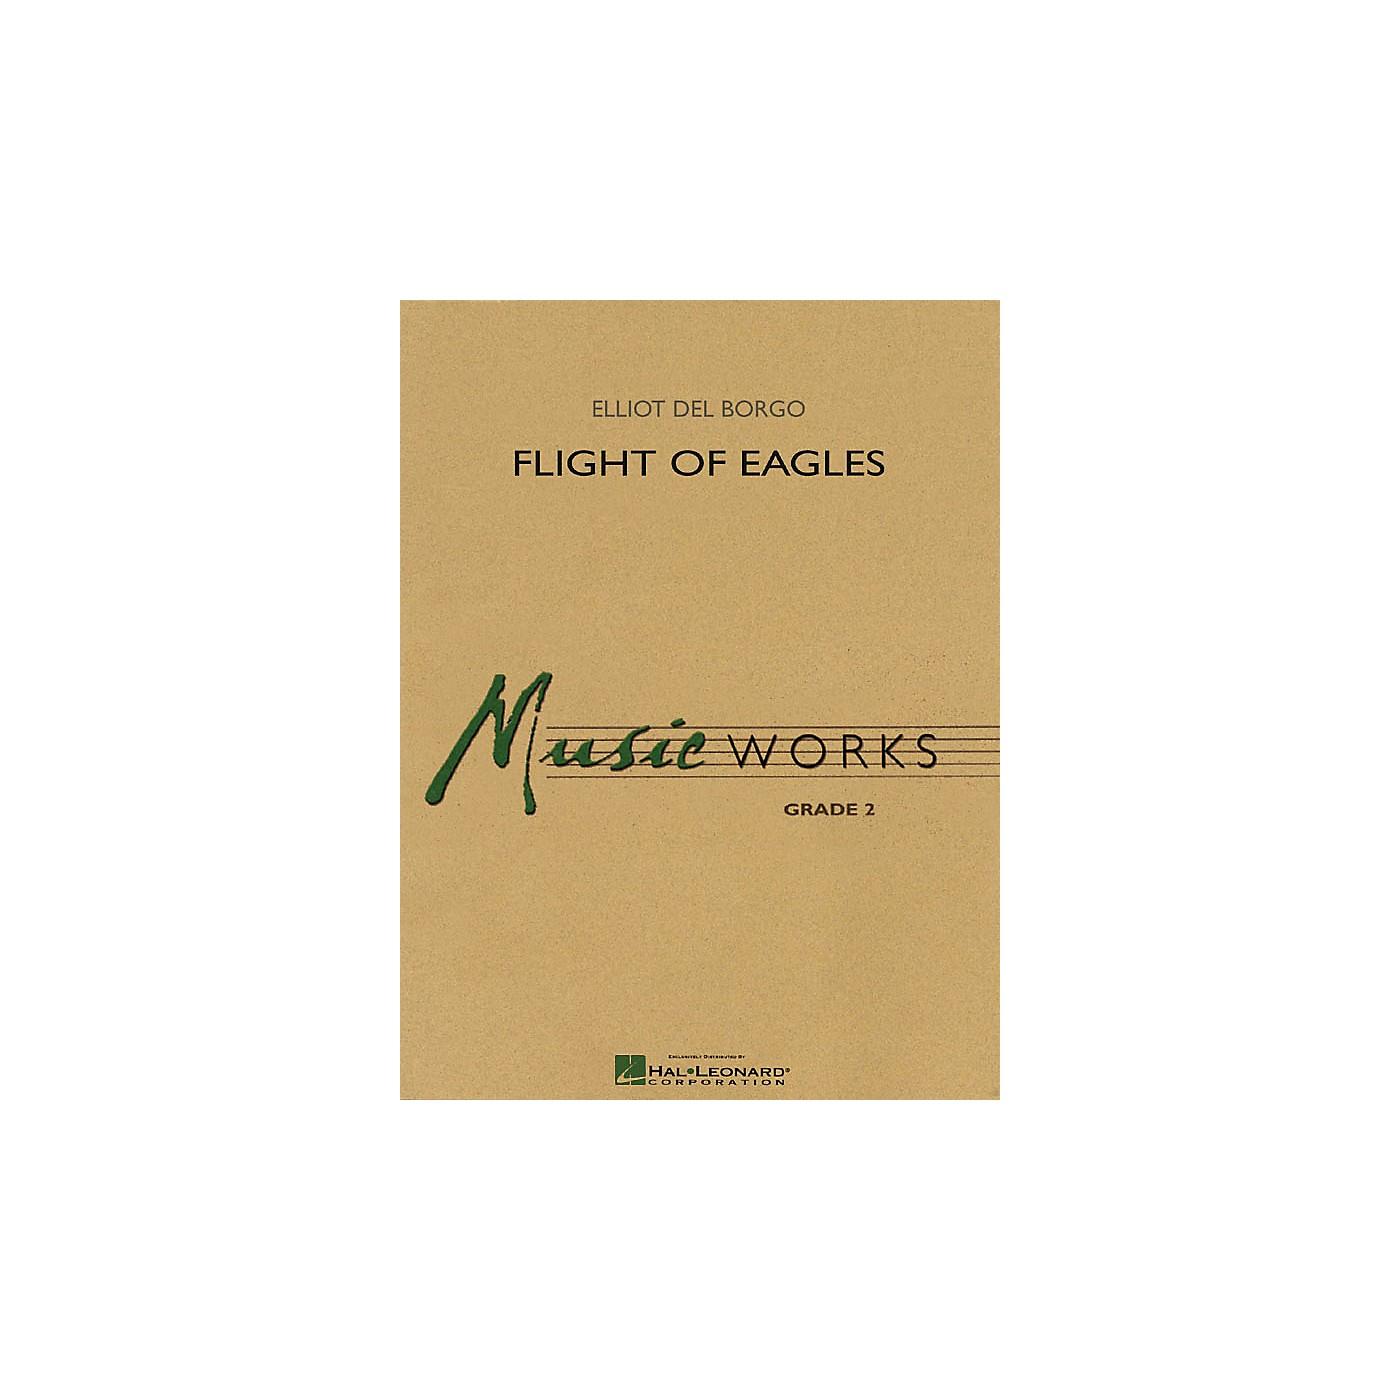 Hal Leonard Flight of Eagles Concert Band Level 2 Composed by Elliot Del Borgo thumbnail